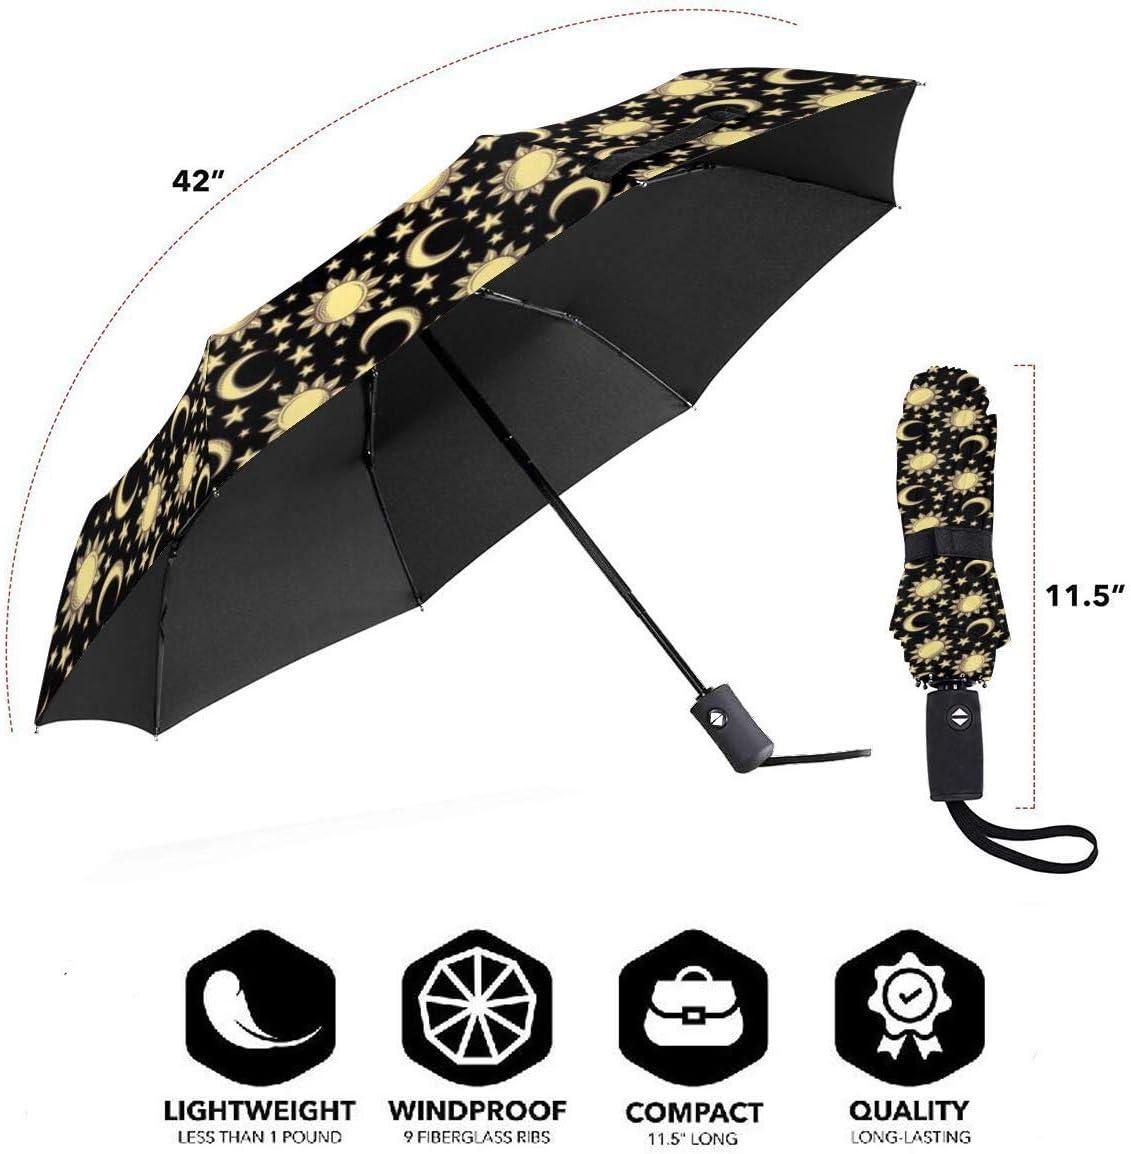 Sun Moon Star Umbrella Compact Rain/&Wind Repellent Umbrellas Sun Protection With Anti UV Coating Travel Auto Folding Umbrella